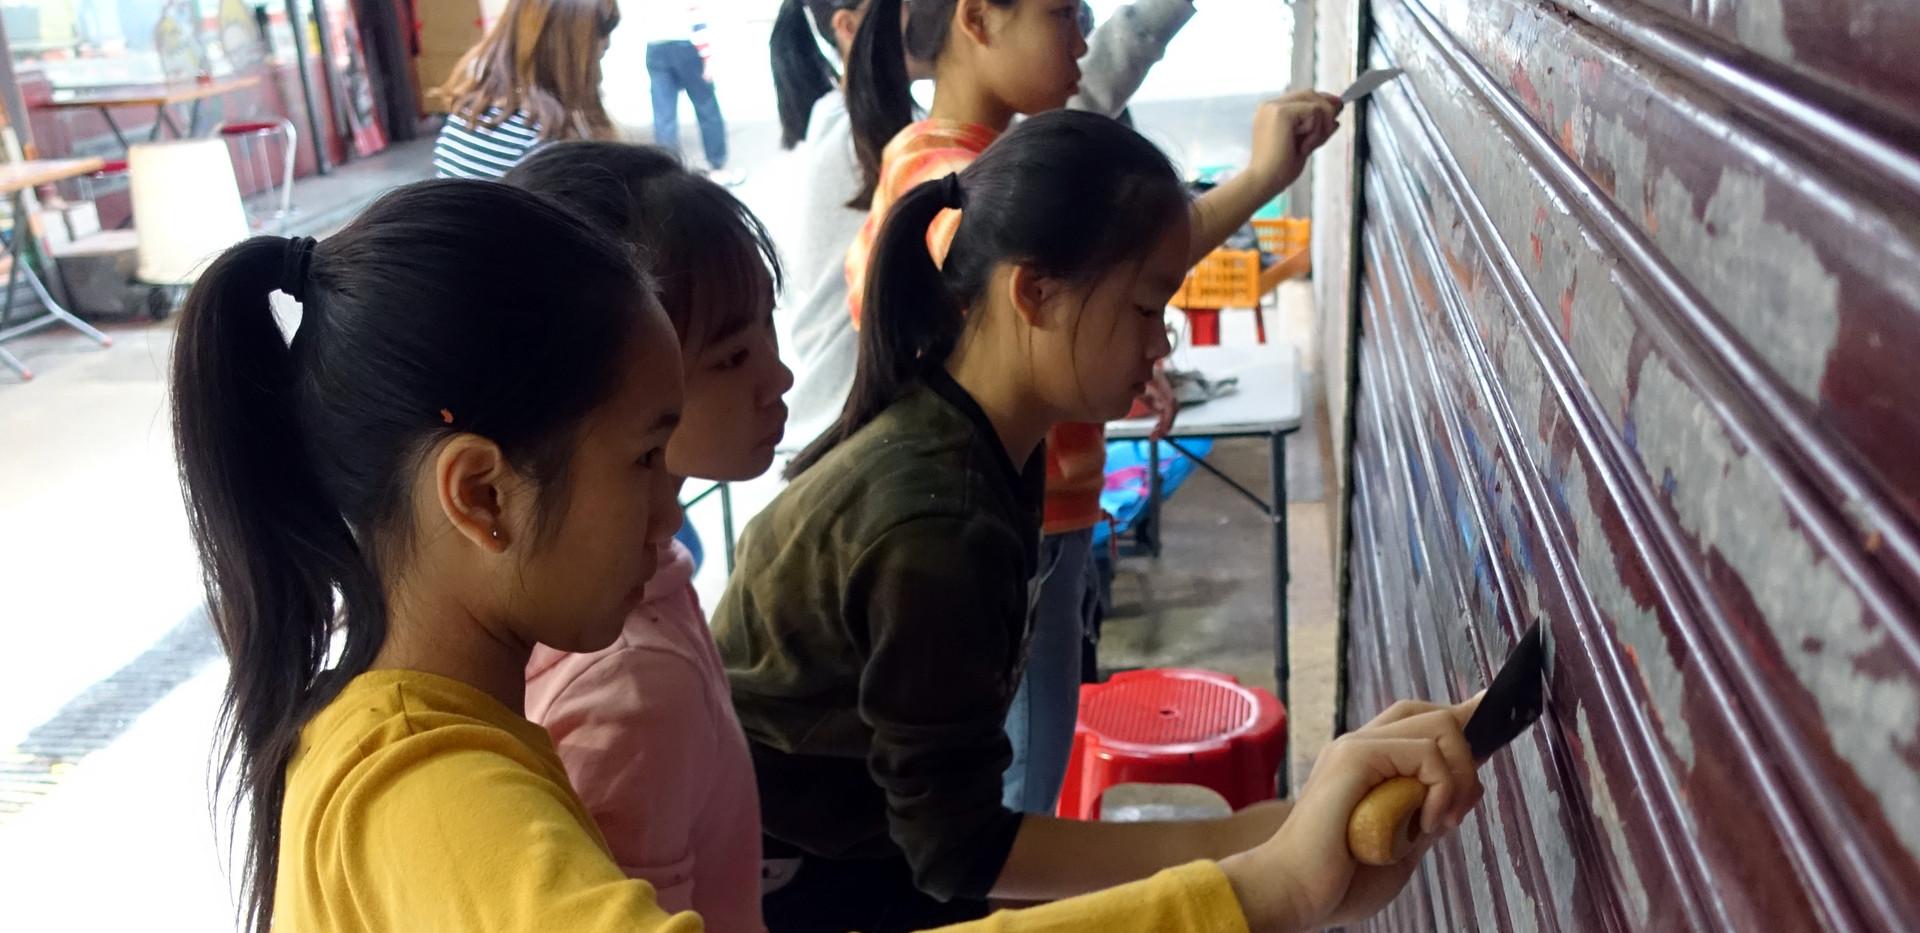 HTYC VA - Wall Painting Team 1920 - 土瓜灣舊區「社區客廳」計劃 - 鐵閘說故事創作坊